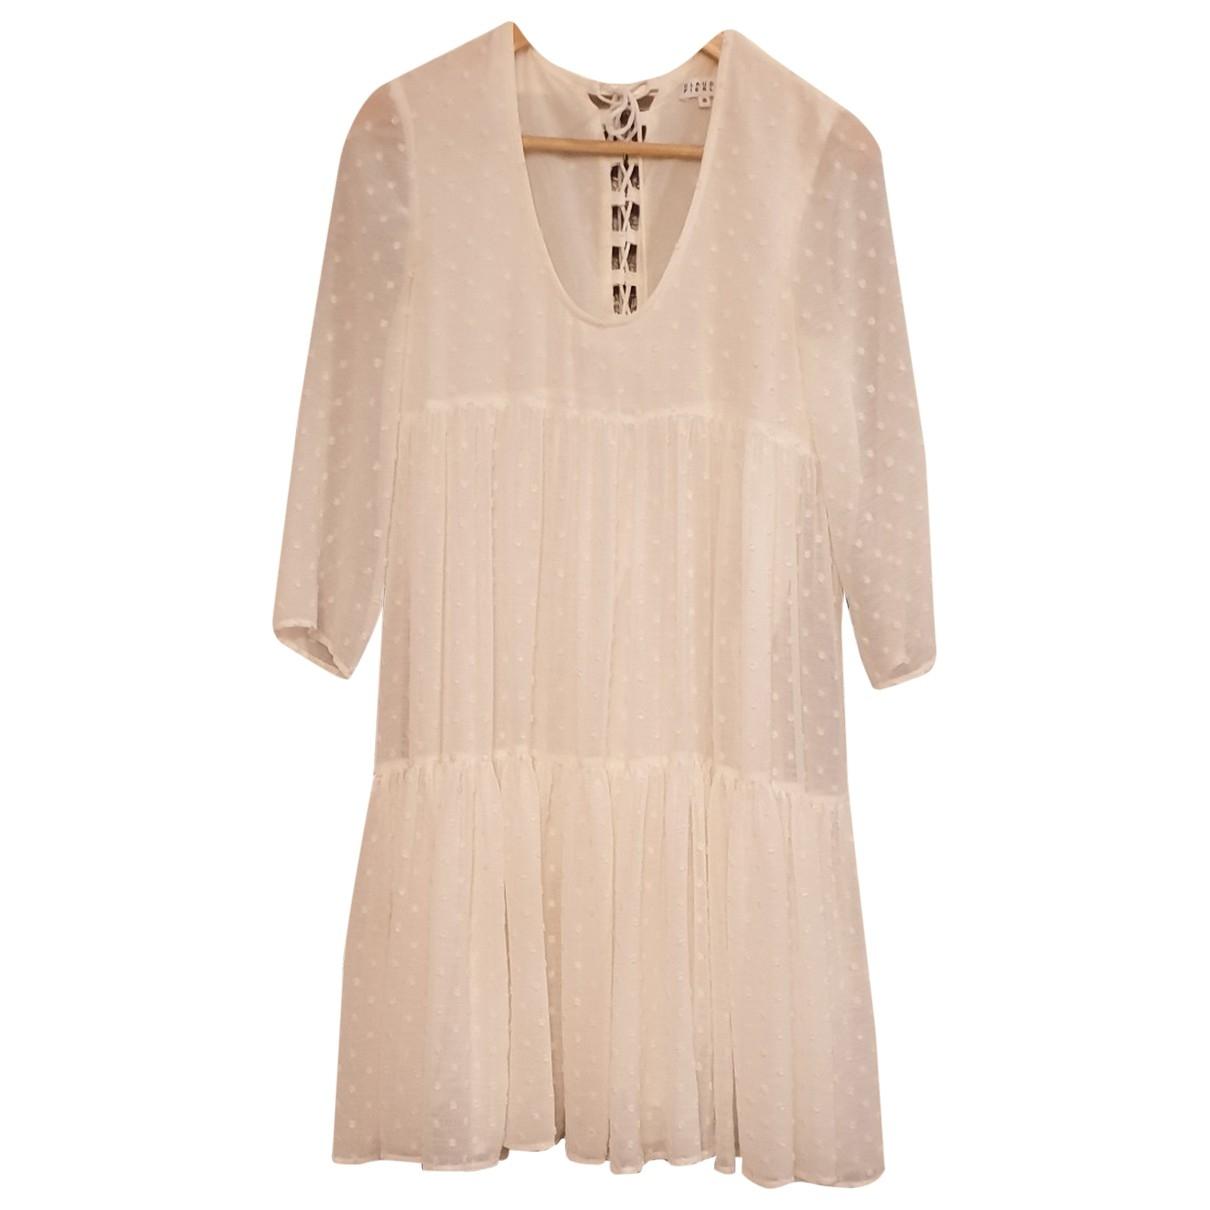 Claudie Pierlot \N White dress for Women 38 FR